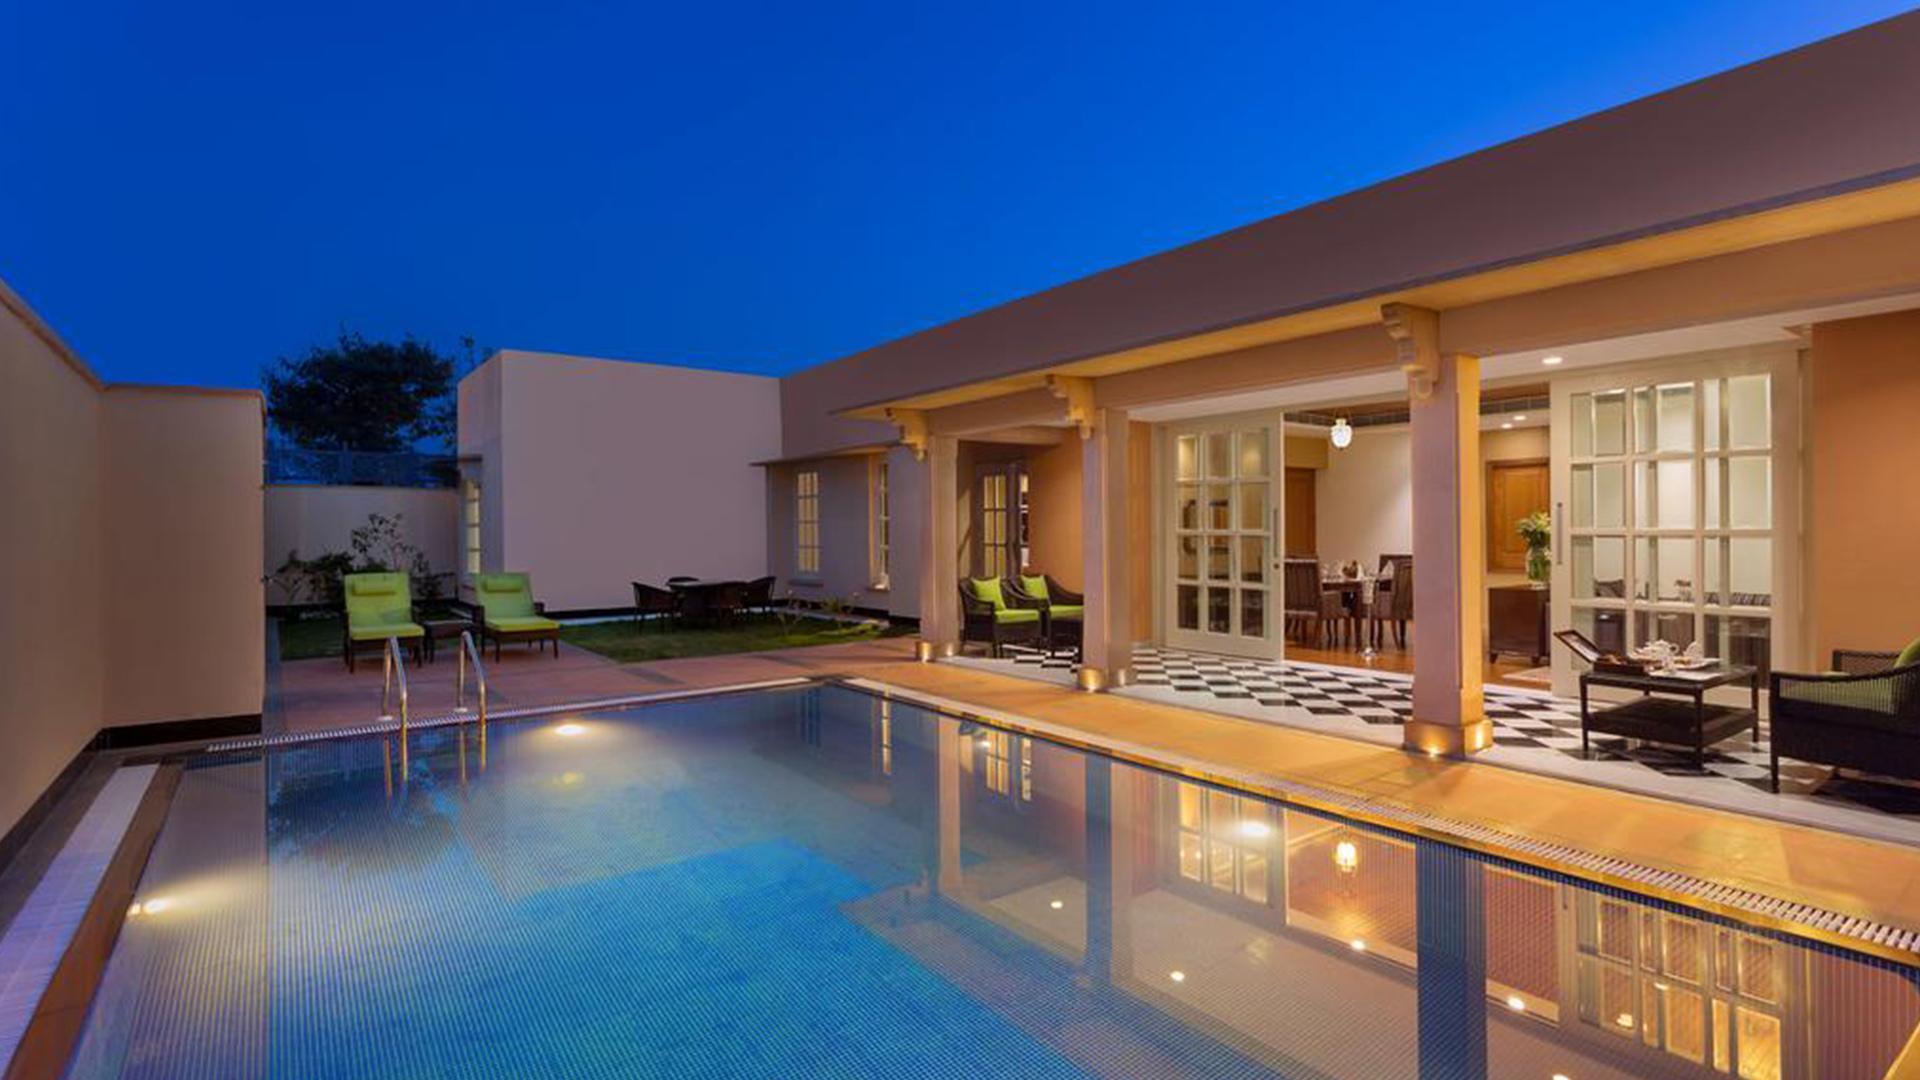 Two-Bedroom Luxury Pool Villa image 1 at Welcomhotel Jodhpur by Jodhpur, Rajasthan, India